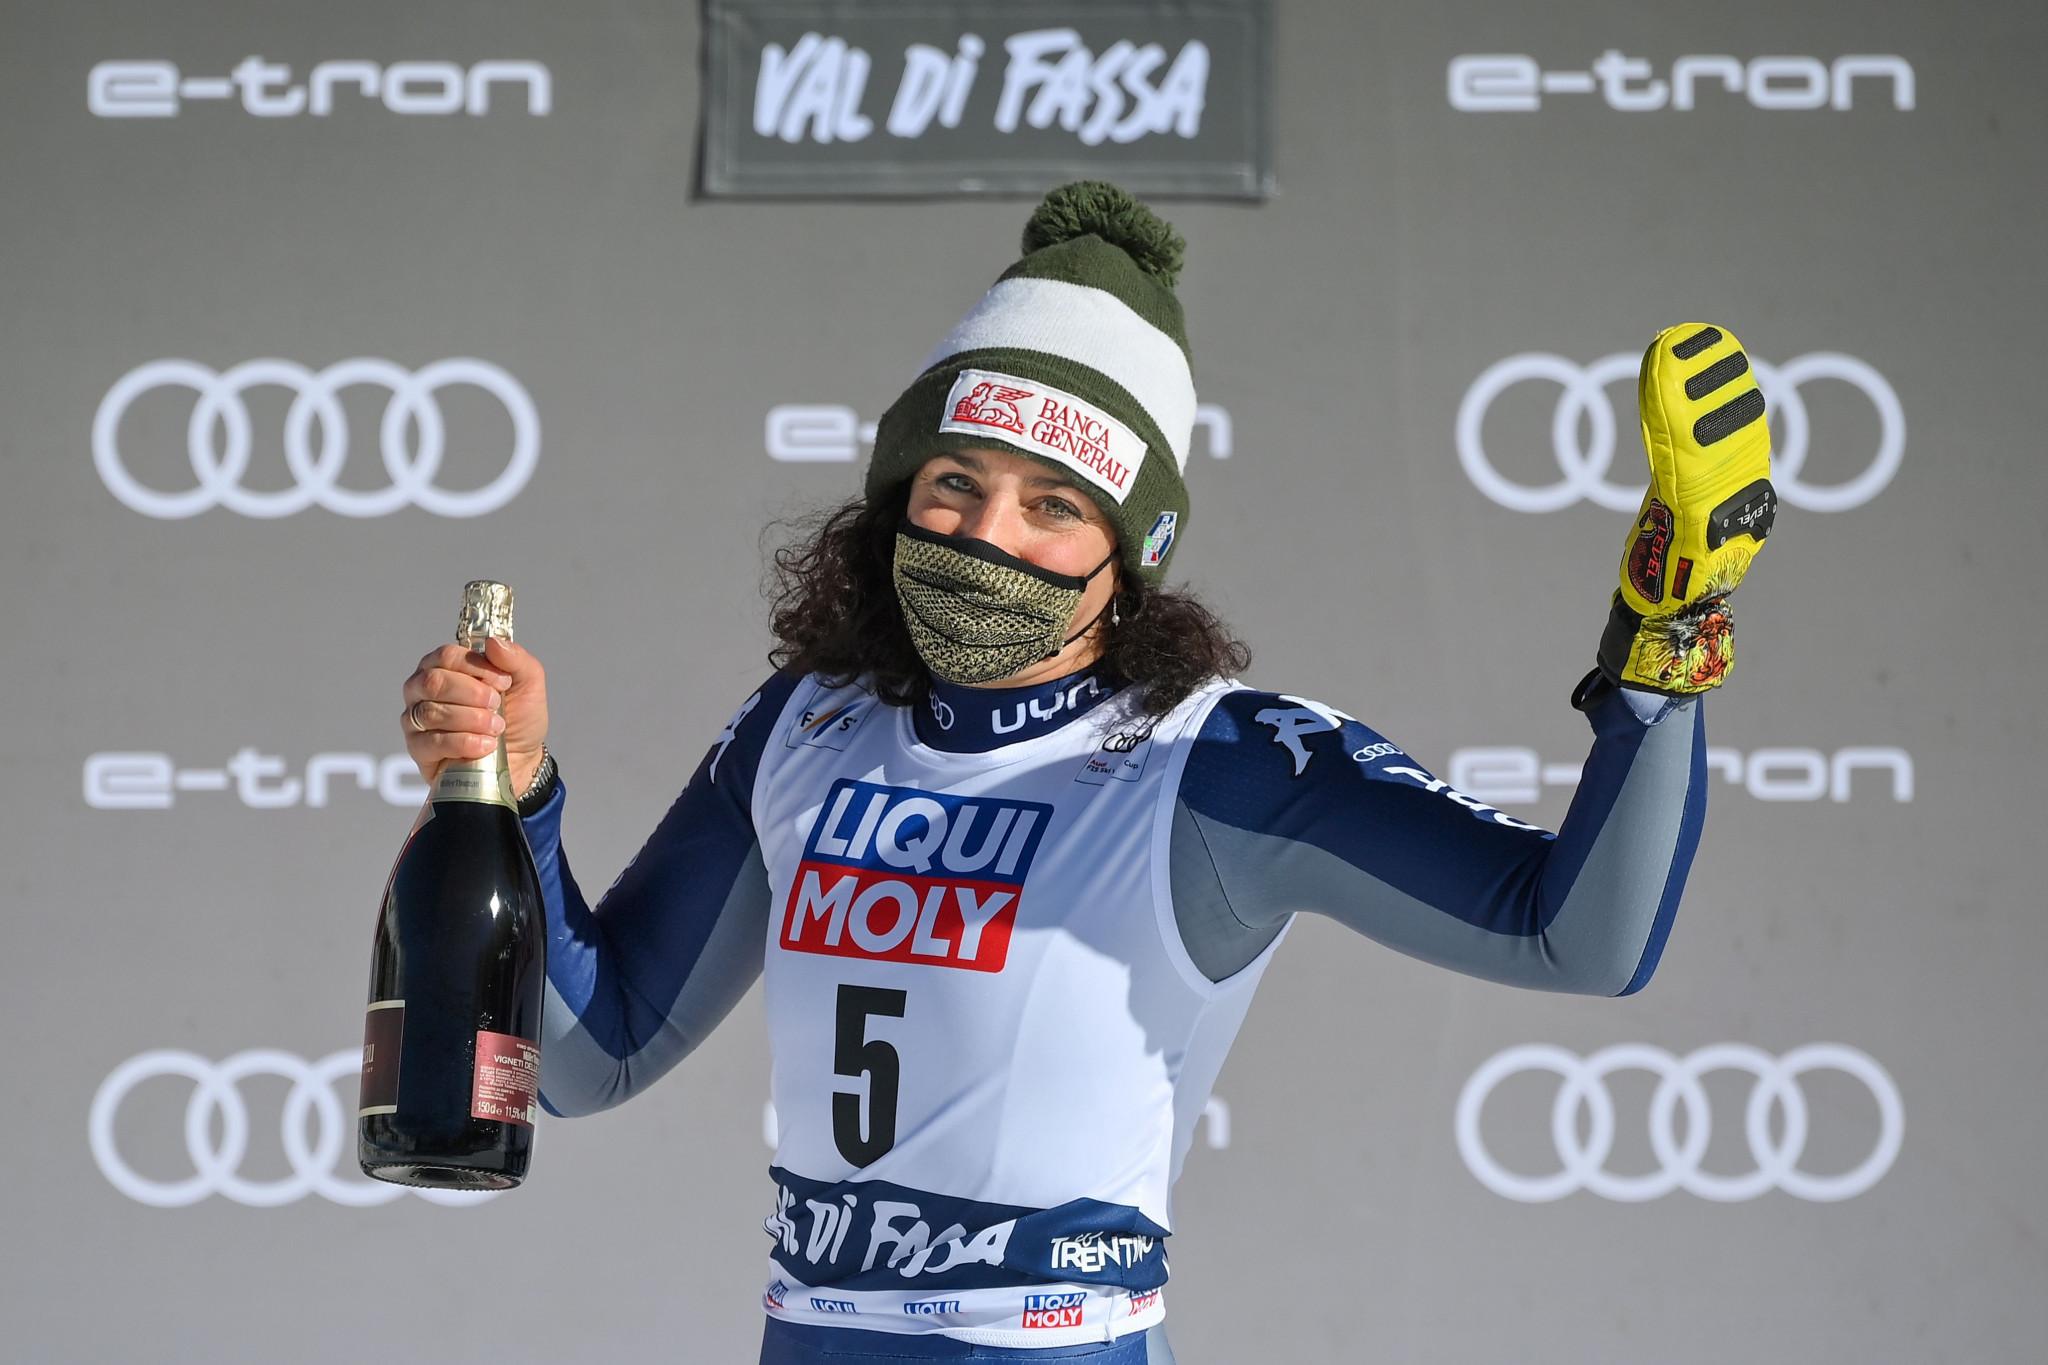 Gut-Behrami secures super-G crystal globe but Brignone ends winning run